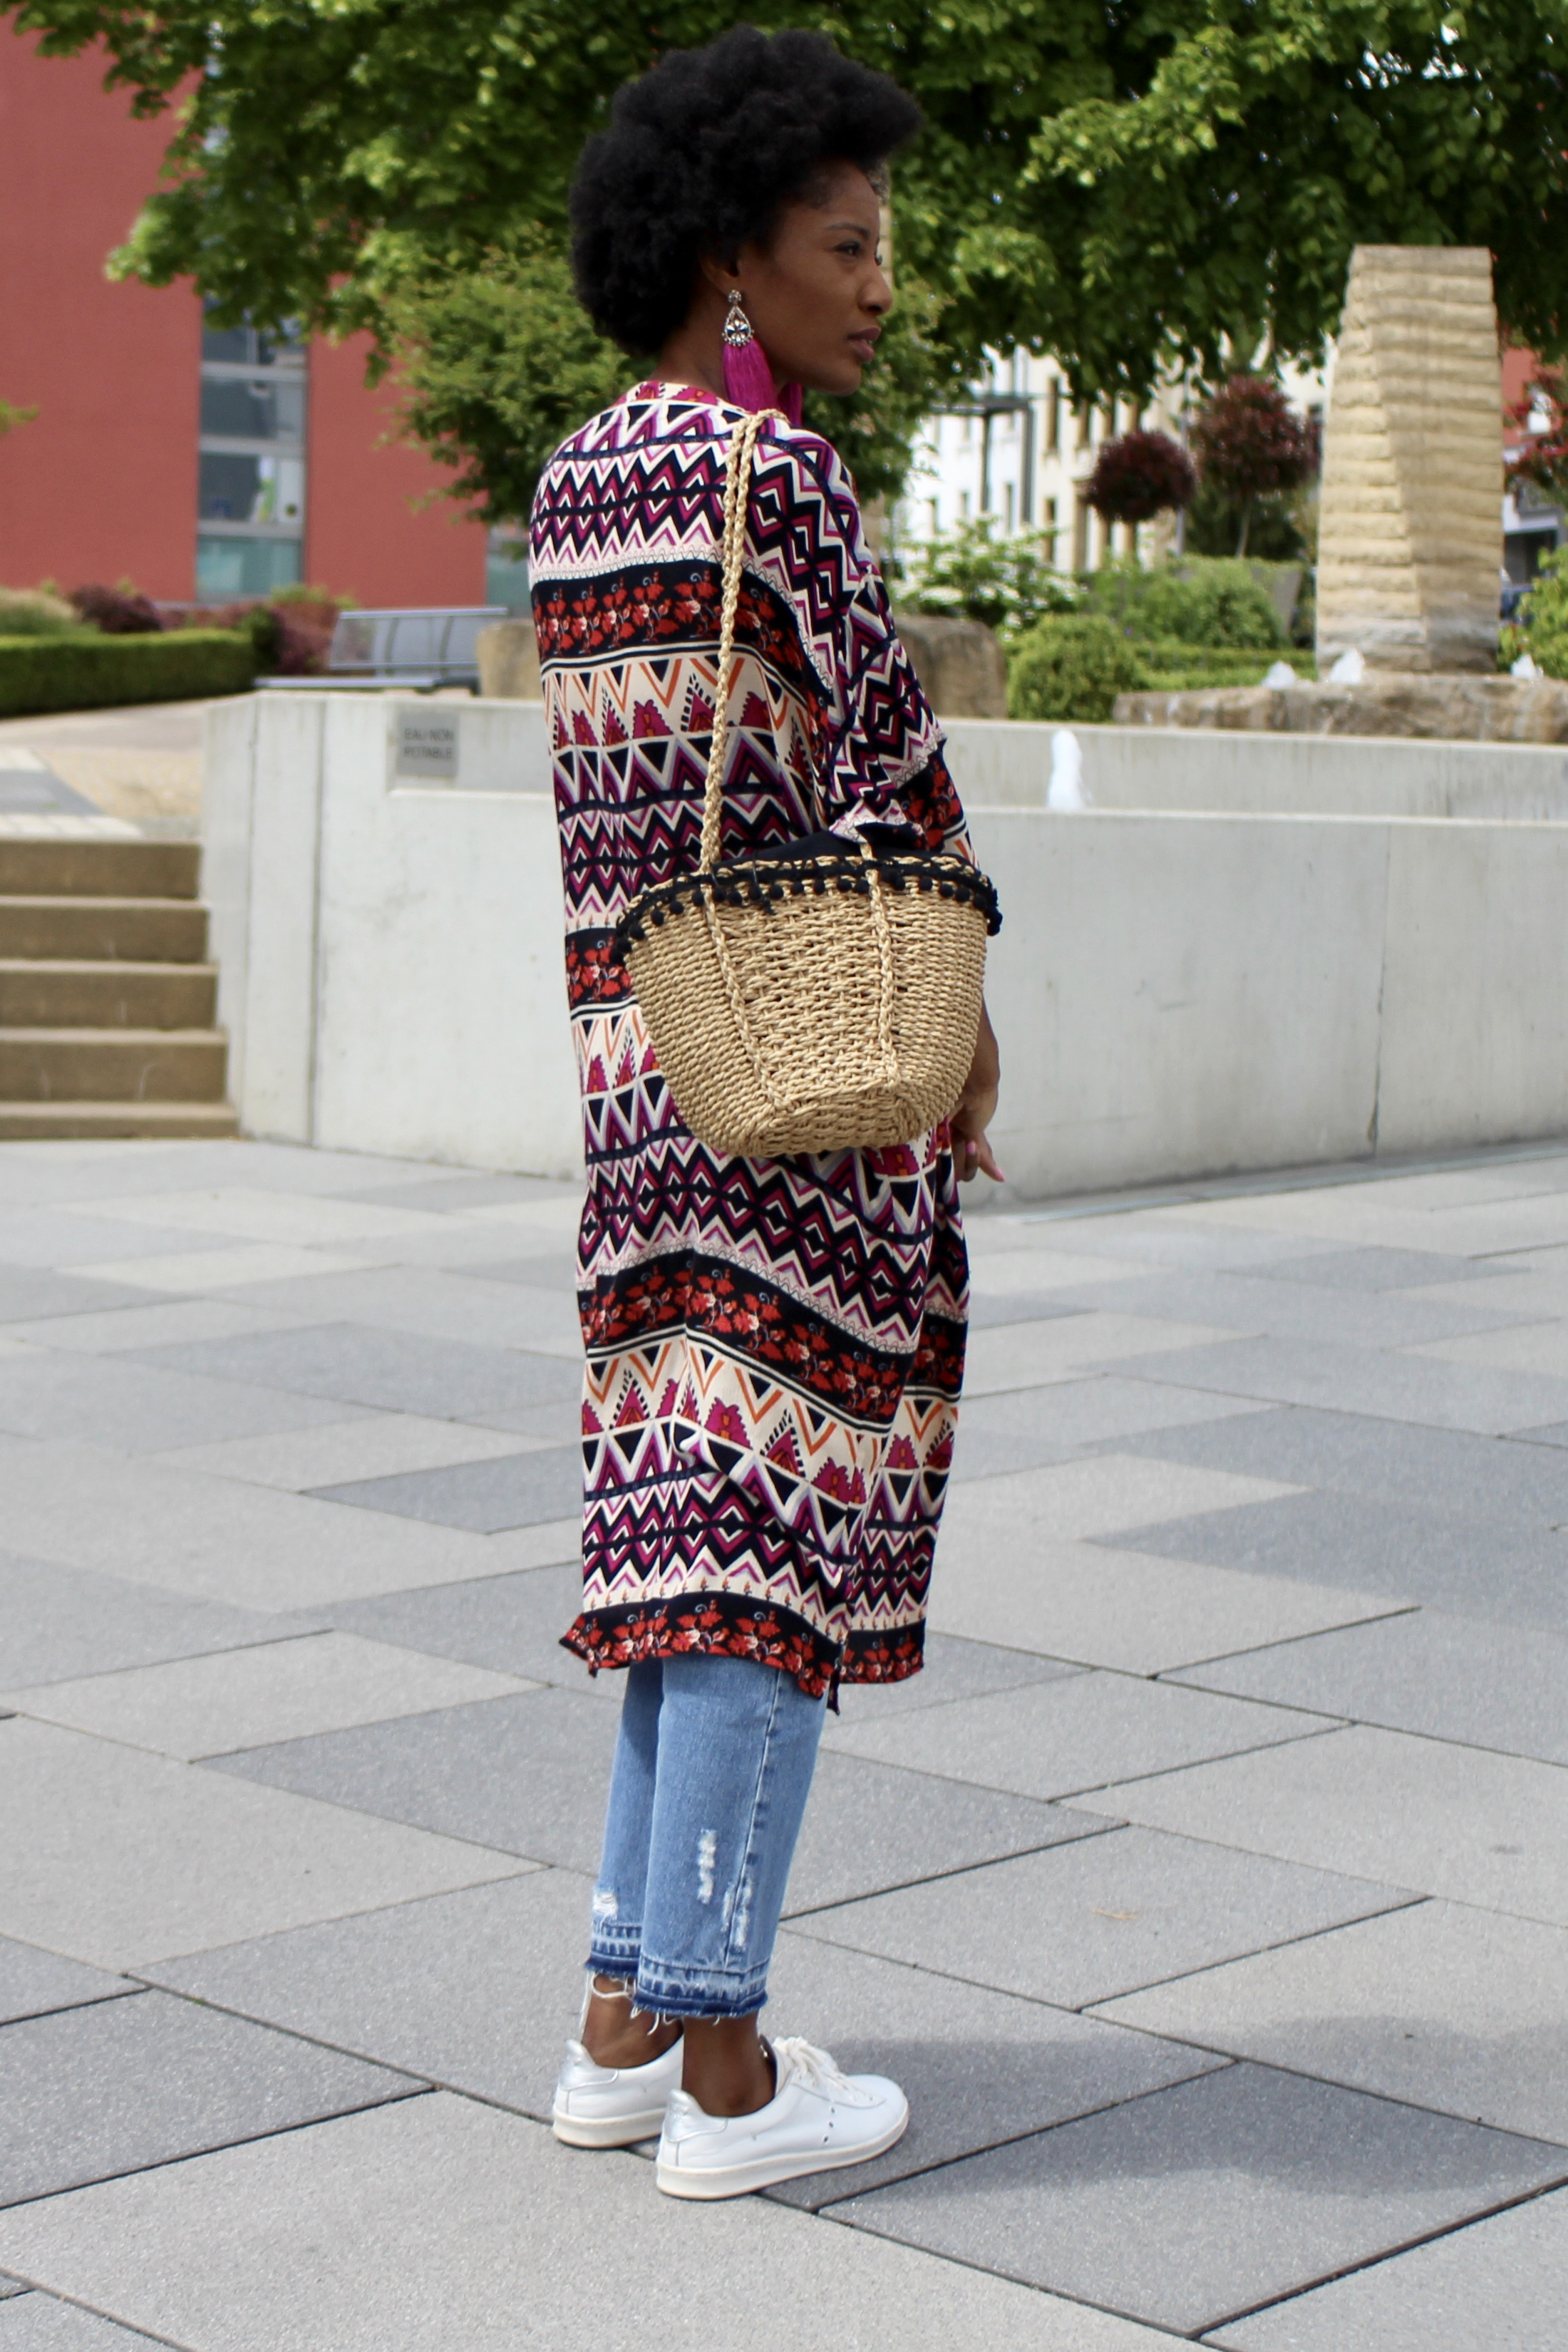 kimono causal outfit